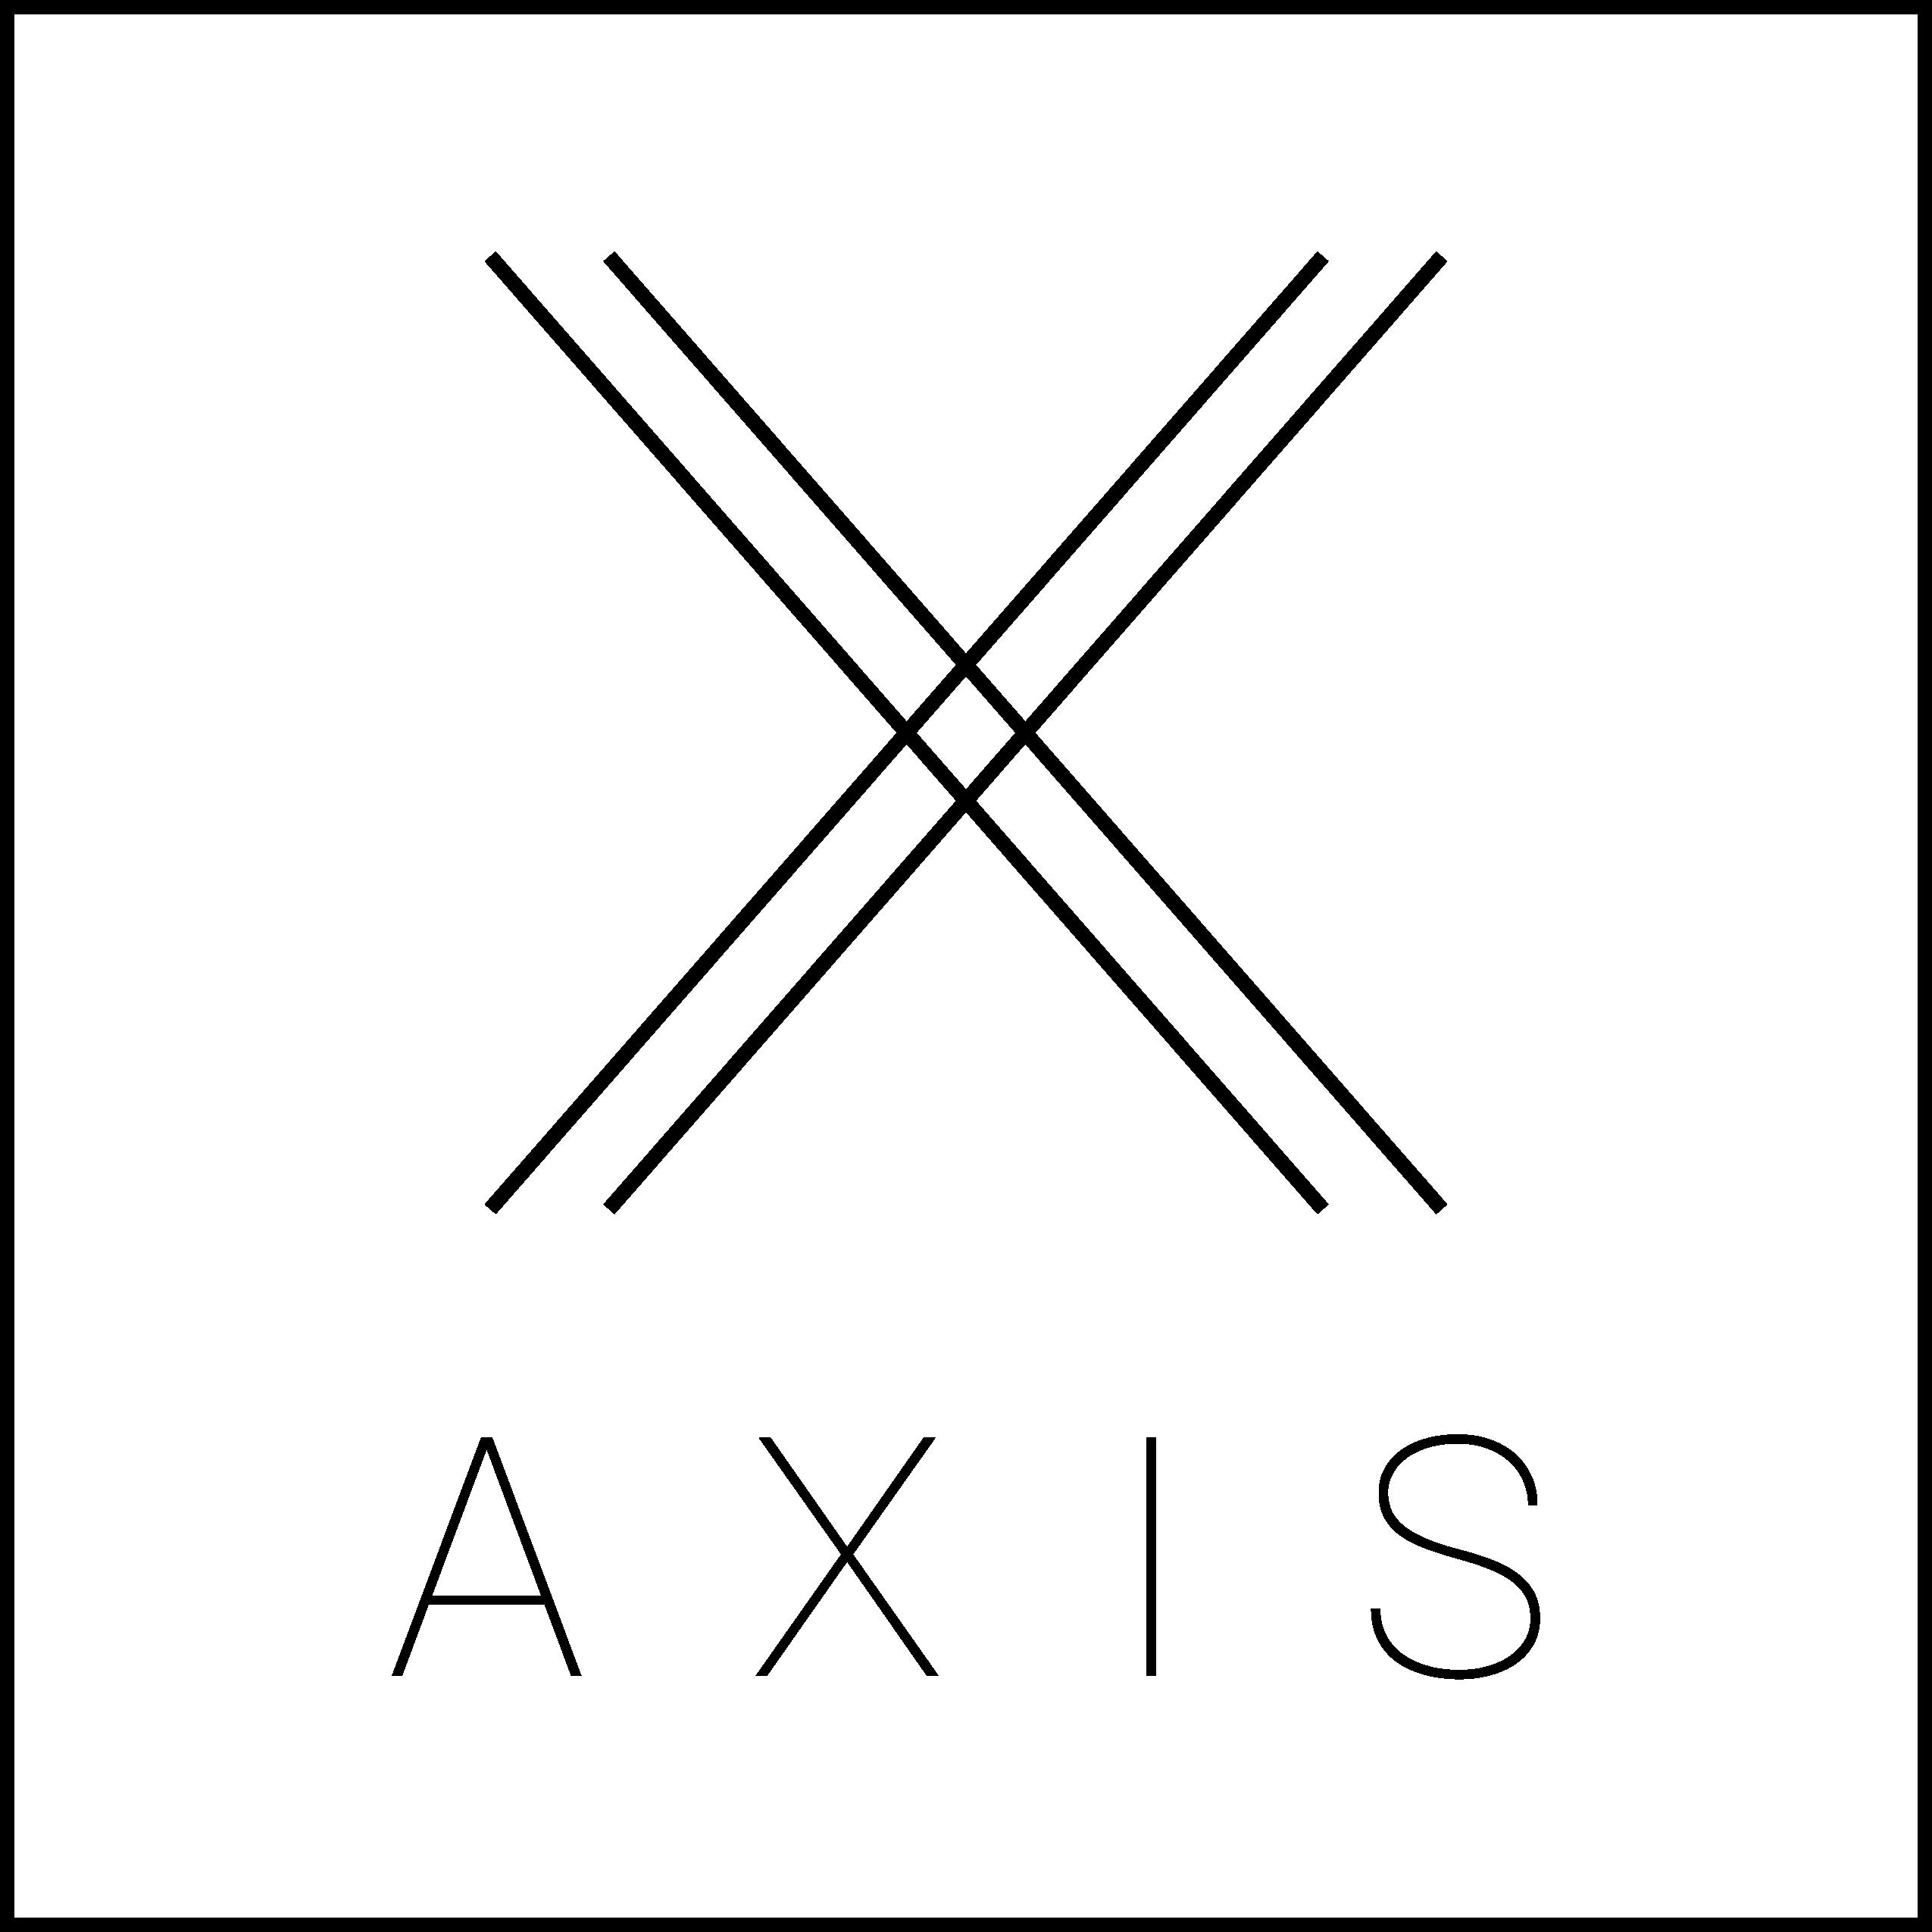 axis-logo_square_